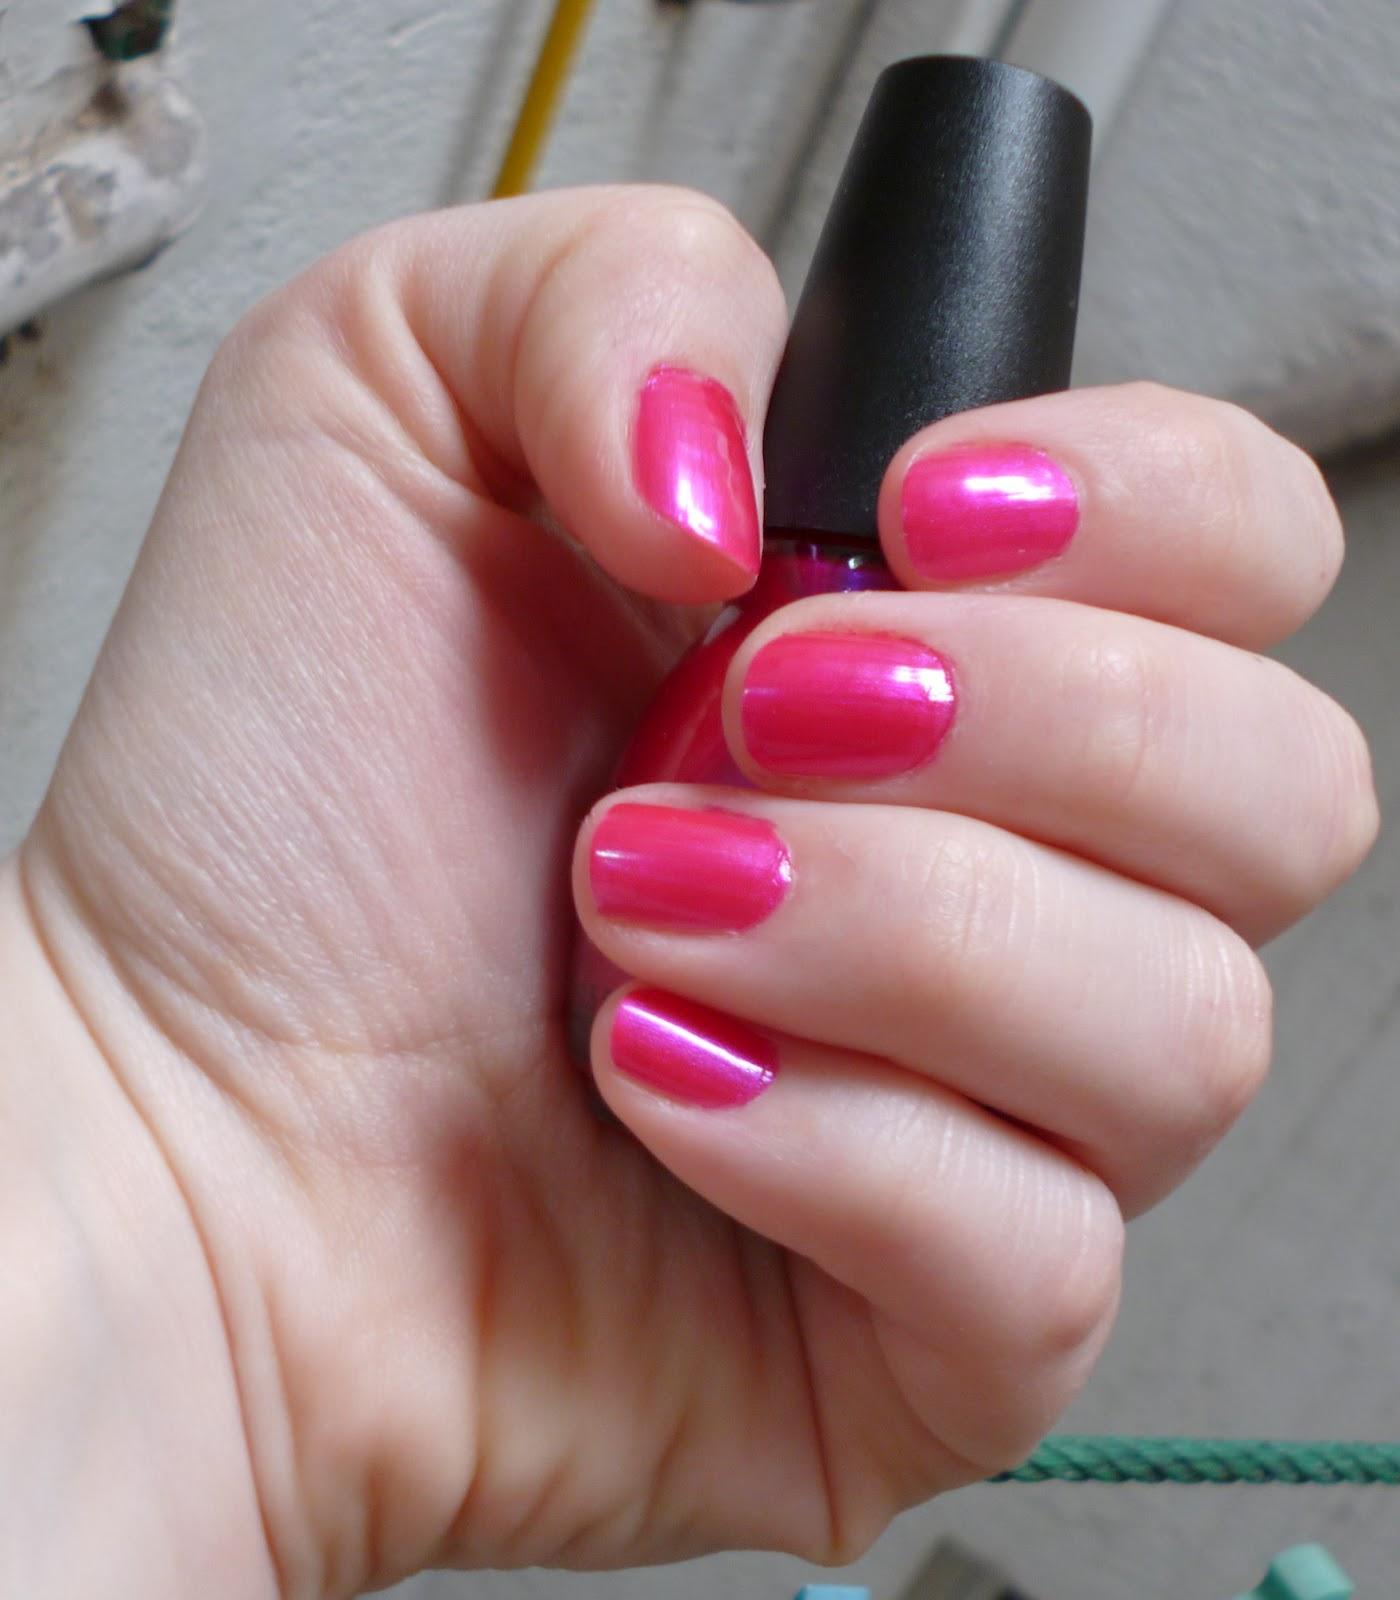 La vida en rosa: abril 2012